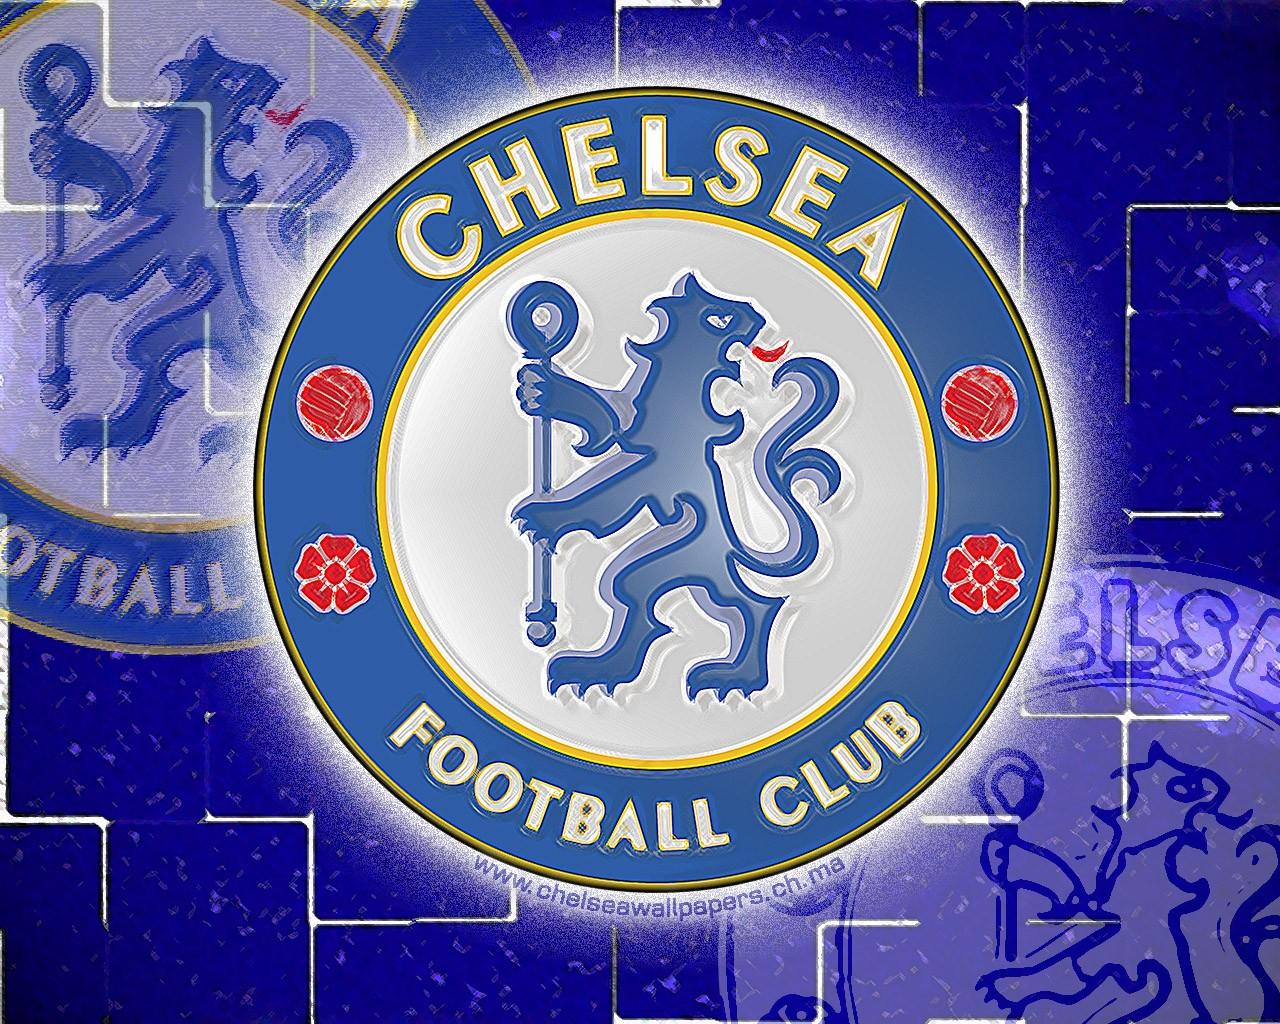 Faislutfi Chelsea Fc Cfc News